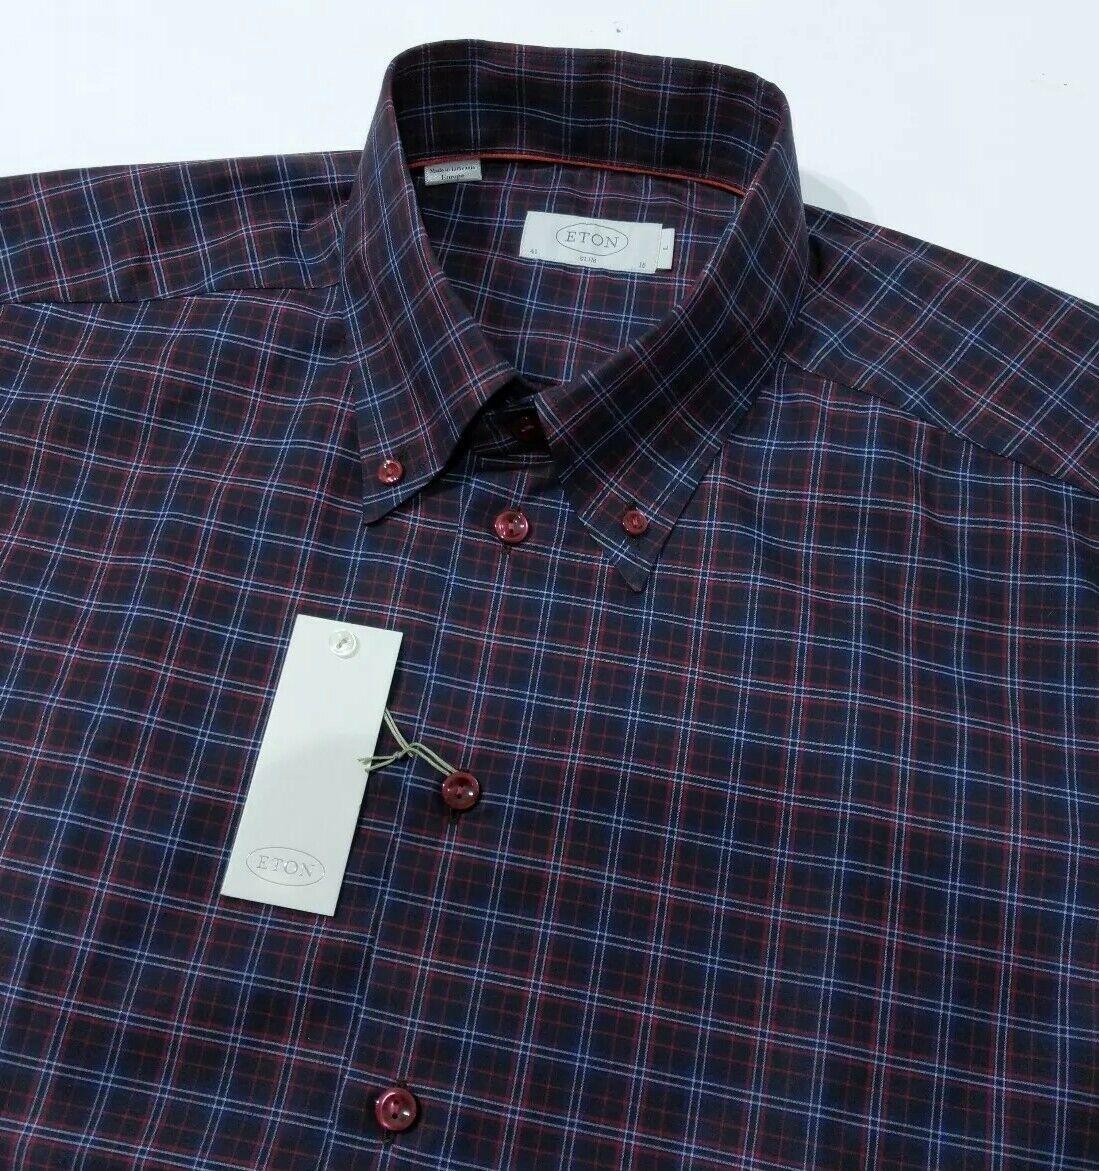 Eton herren hemd Slim Fit Tattersall Check Oxford Größe 16 - 41cm , L New